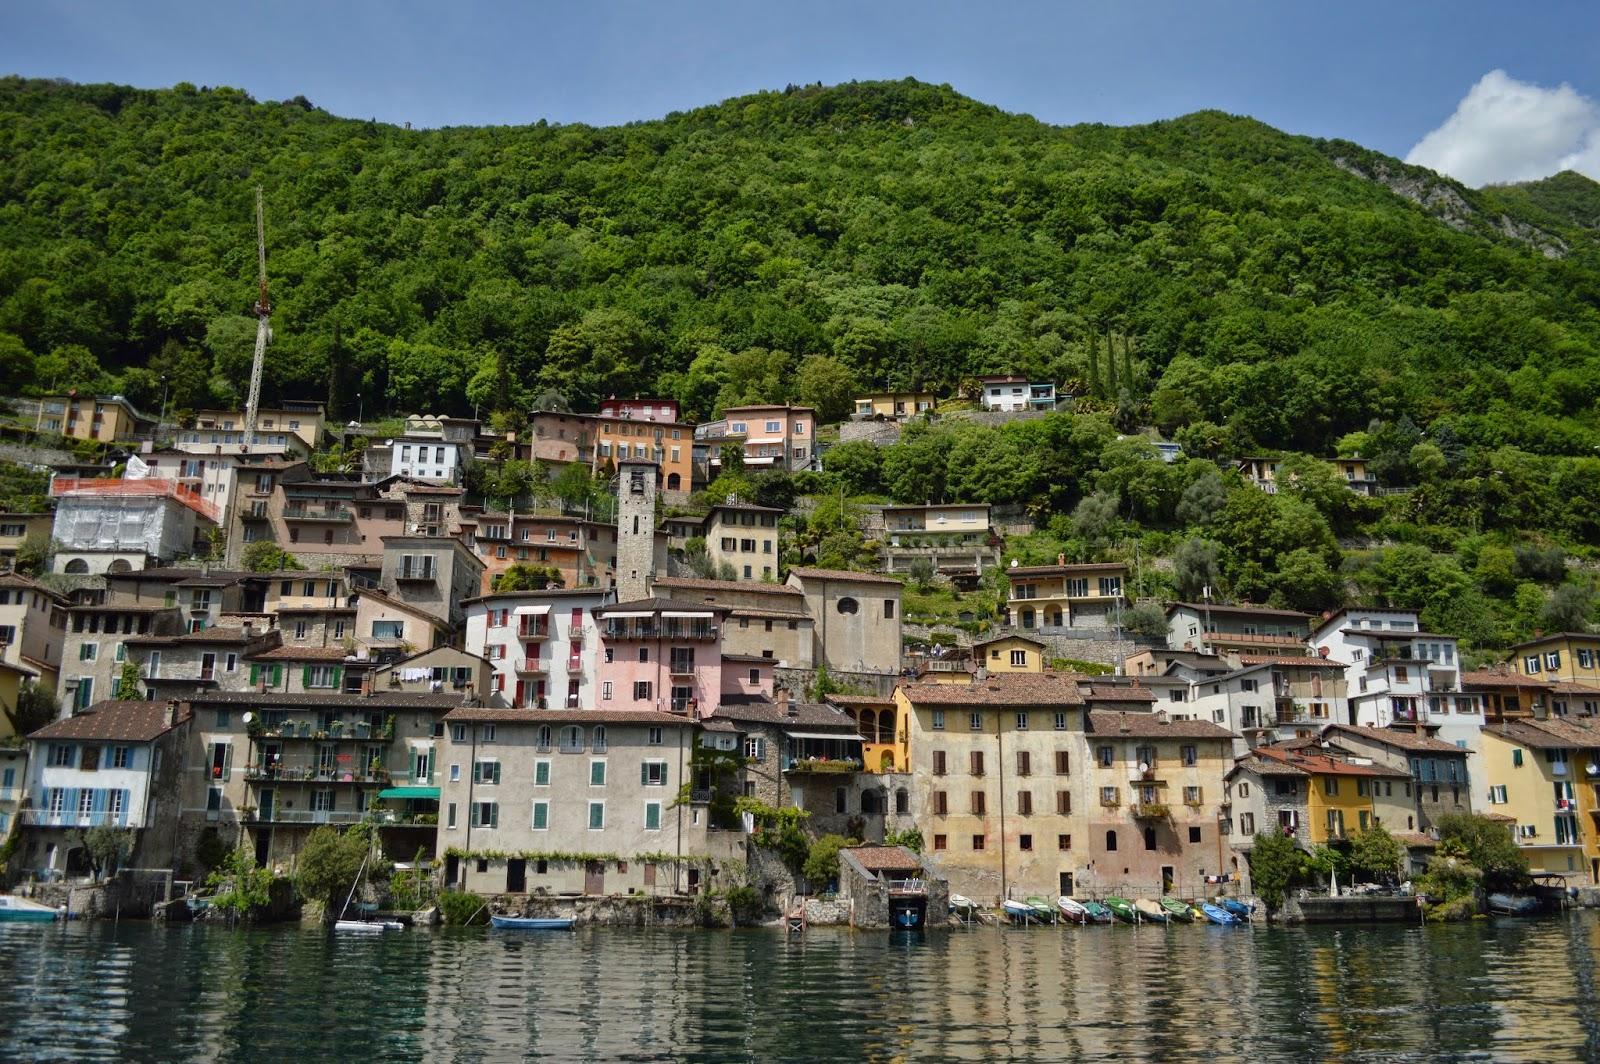 Gandria, Switzerland http://sleachmouradventures.blogspot.com